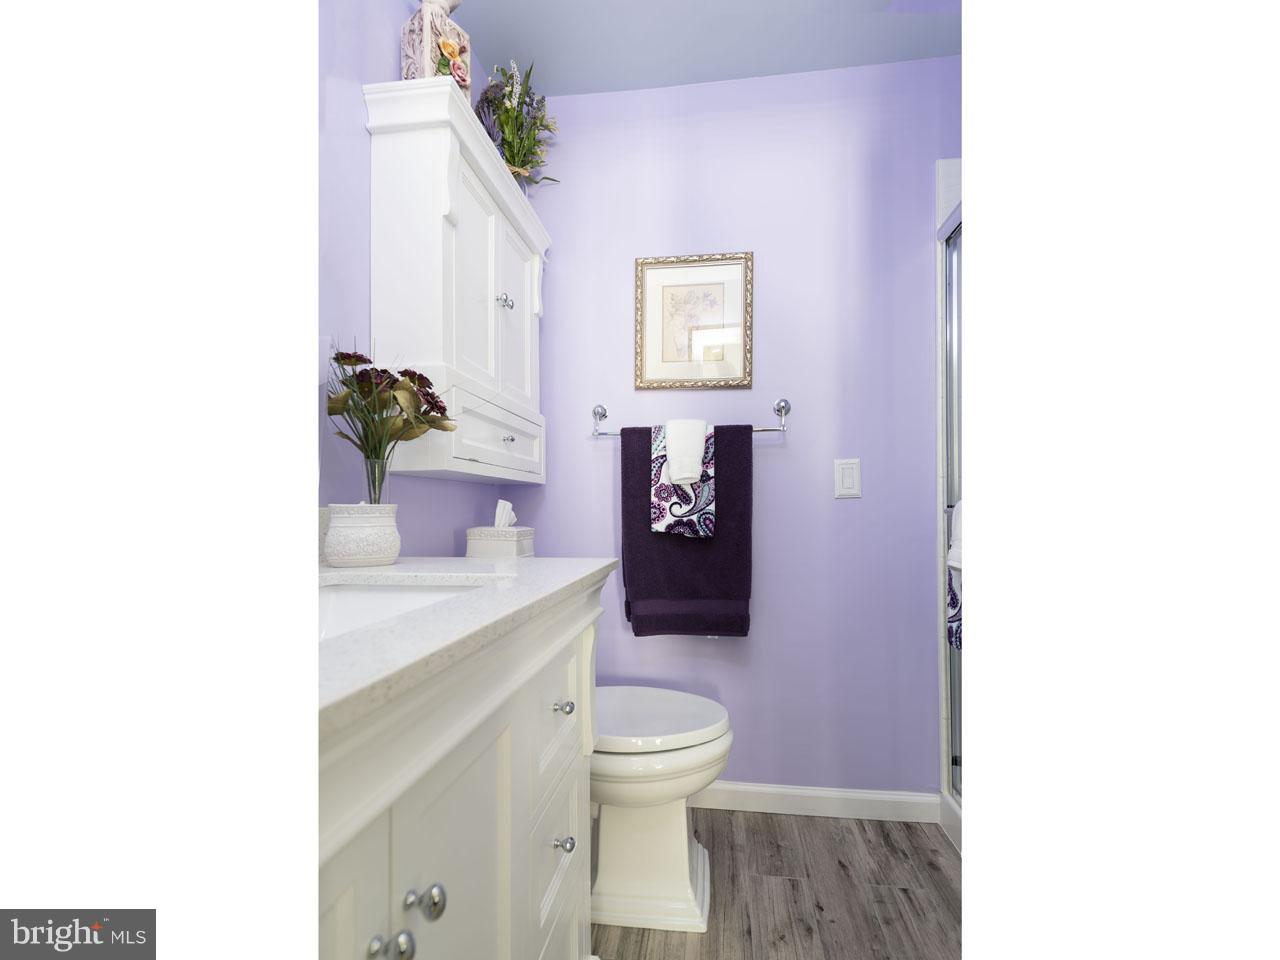 1002640508-300537944167-2021-07-22-05-00-37     Pinecrest   Alexandria Delaware Real Estate For Sale   MLS# 1002640508  - Best of Northern Virginia